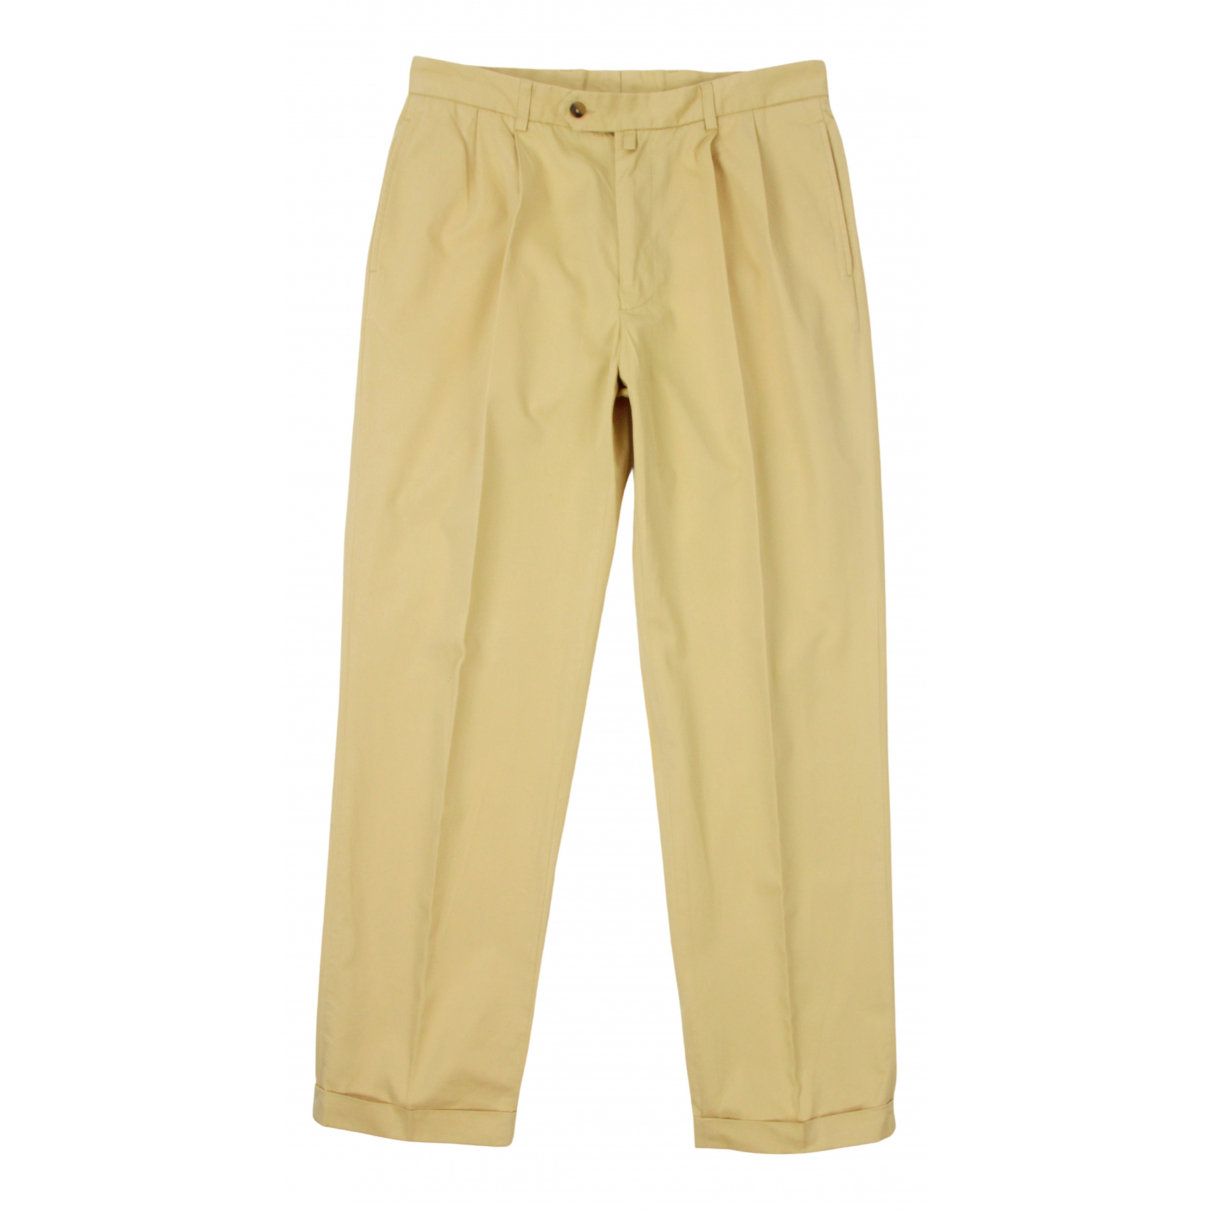 Pantalones en Algodon Amarillo Gant